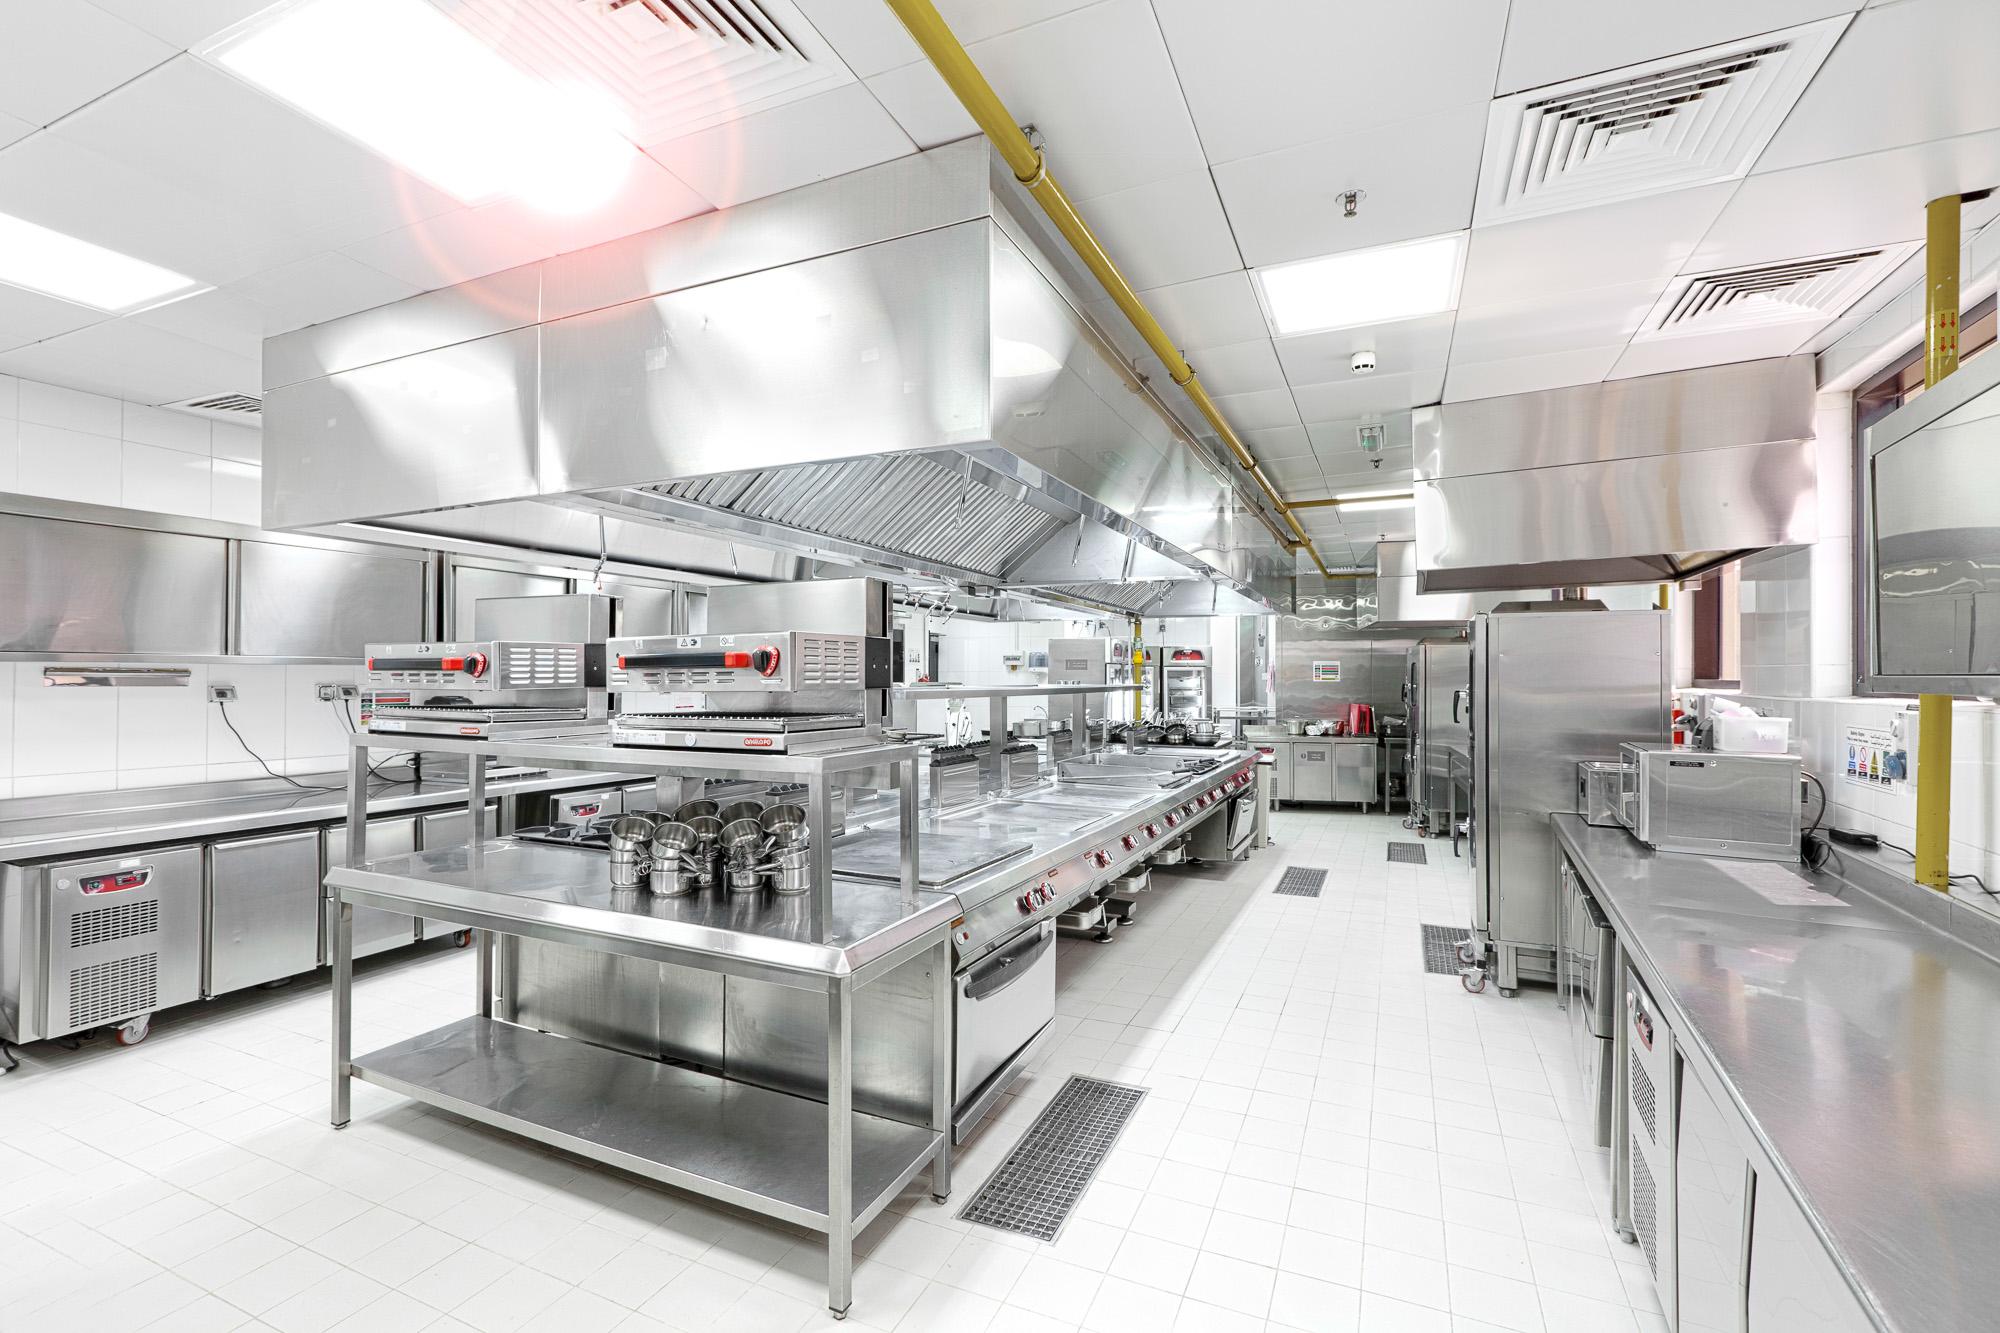 Italia_kitchen_-le_meridien_r-8